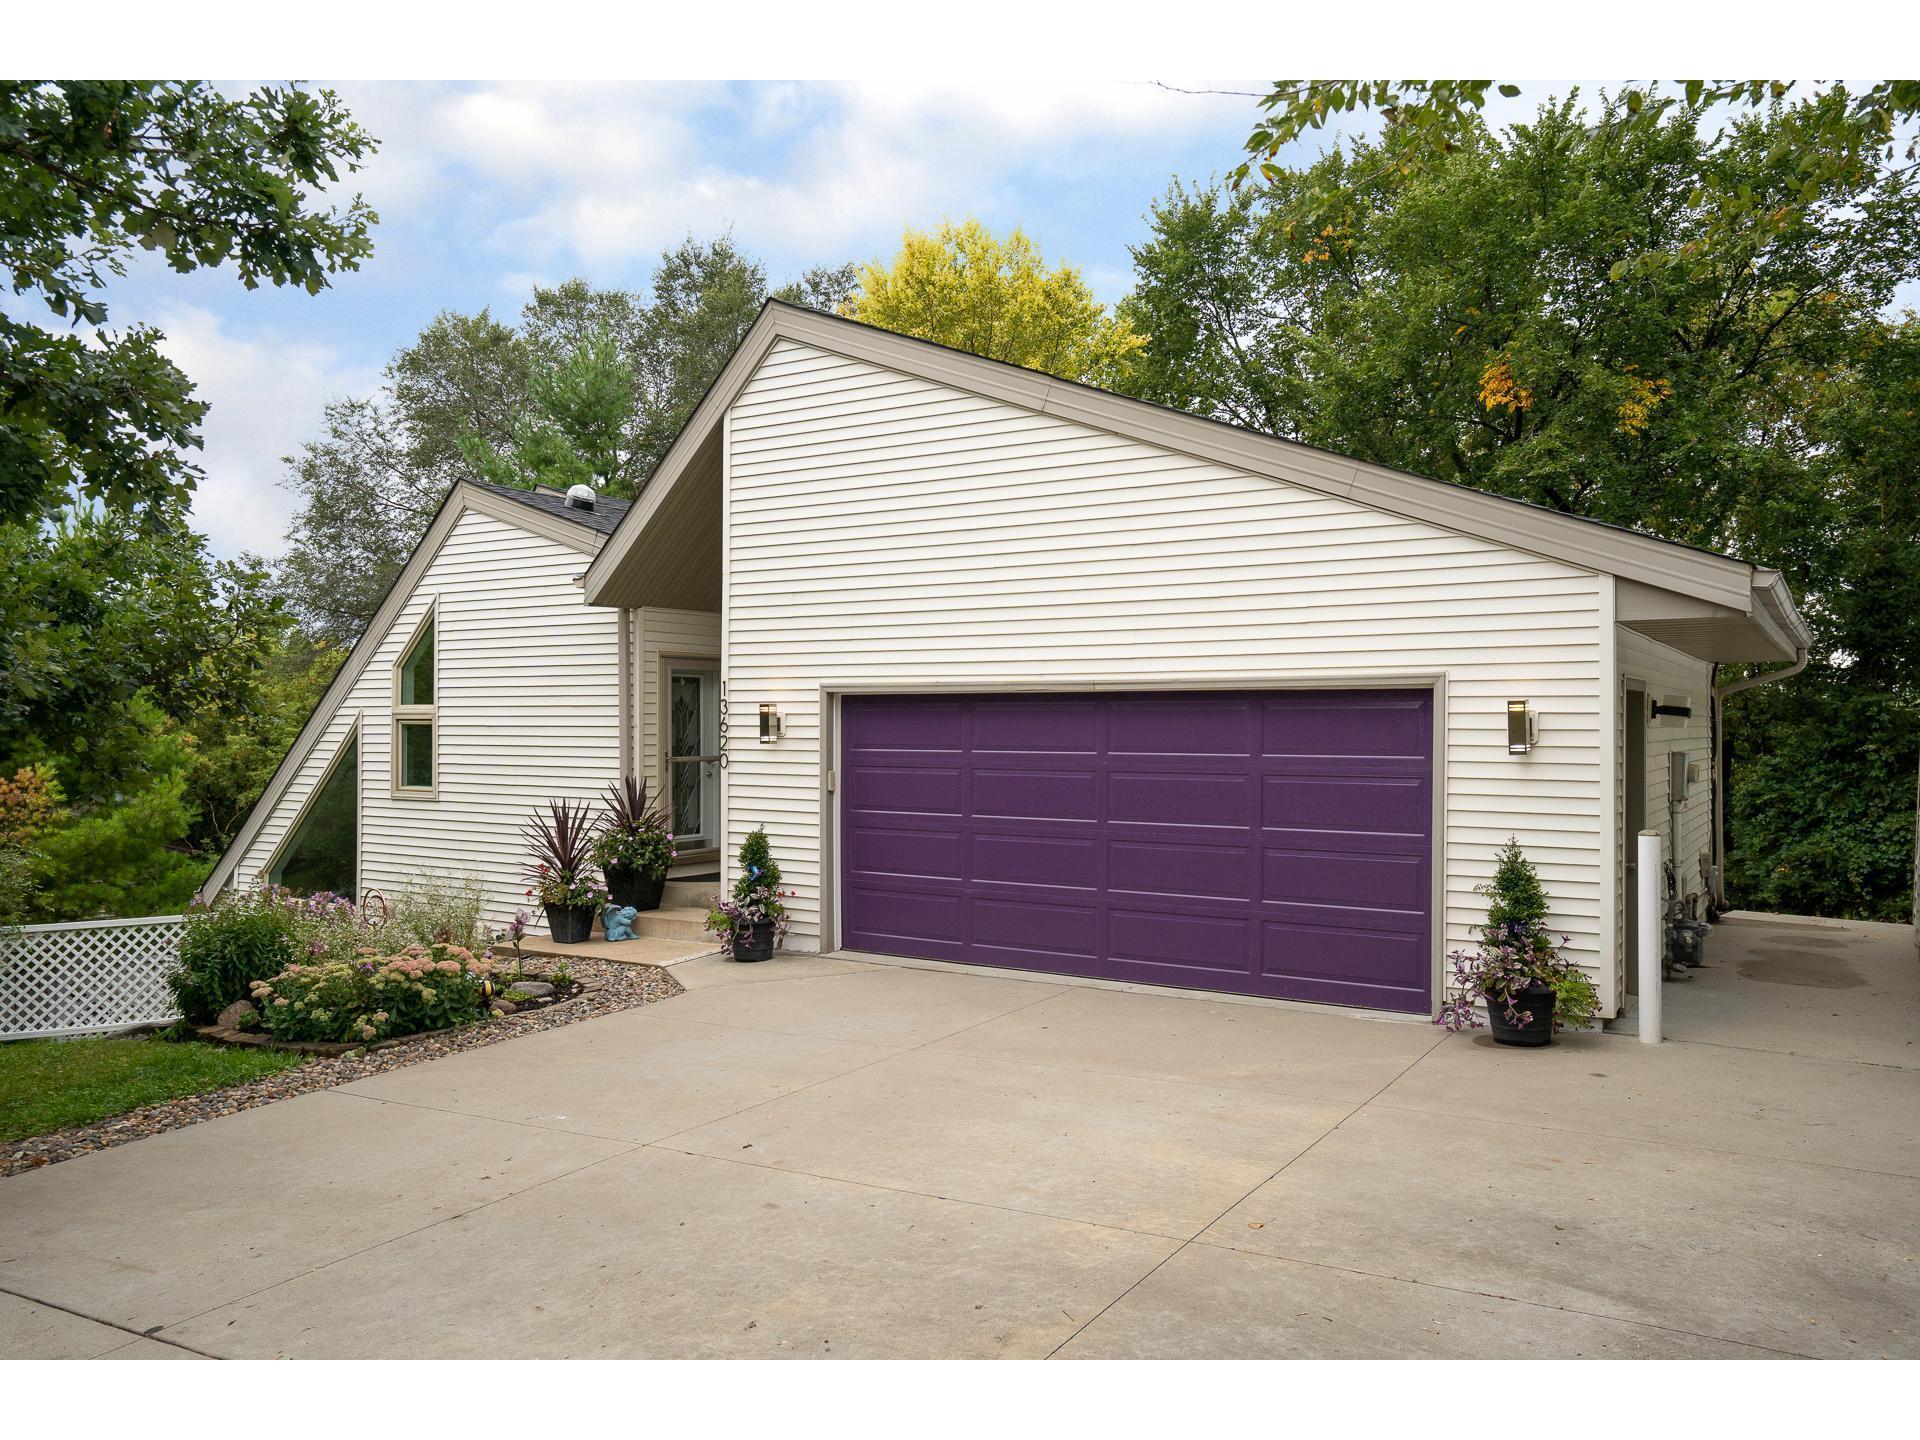 13620 Vincent Circle, Burnsville, MN 55337 | MLS: 5656598 ...